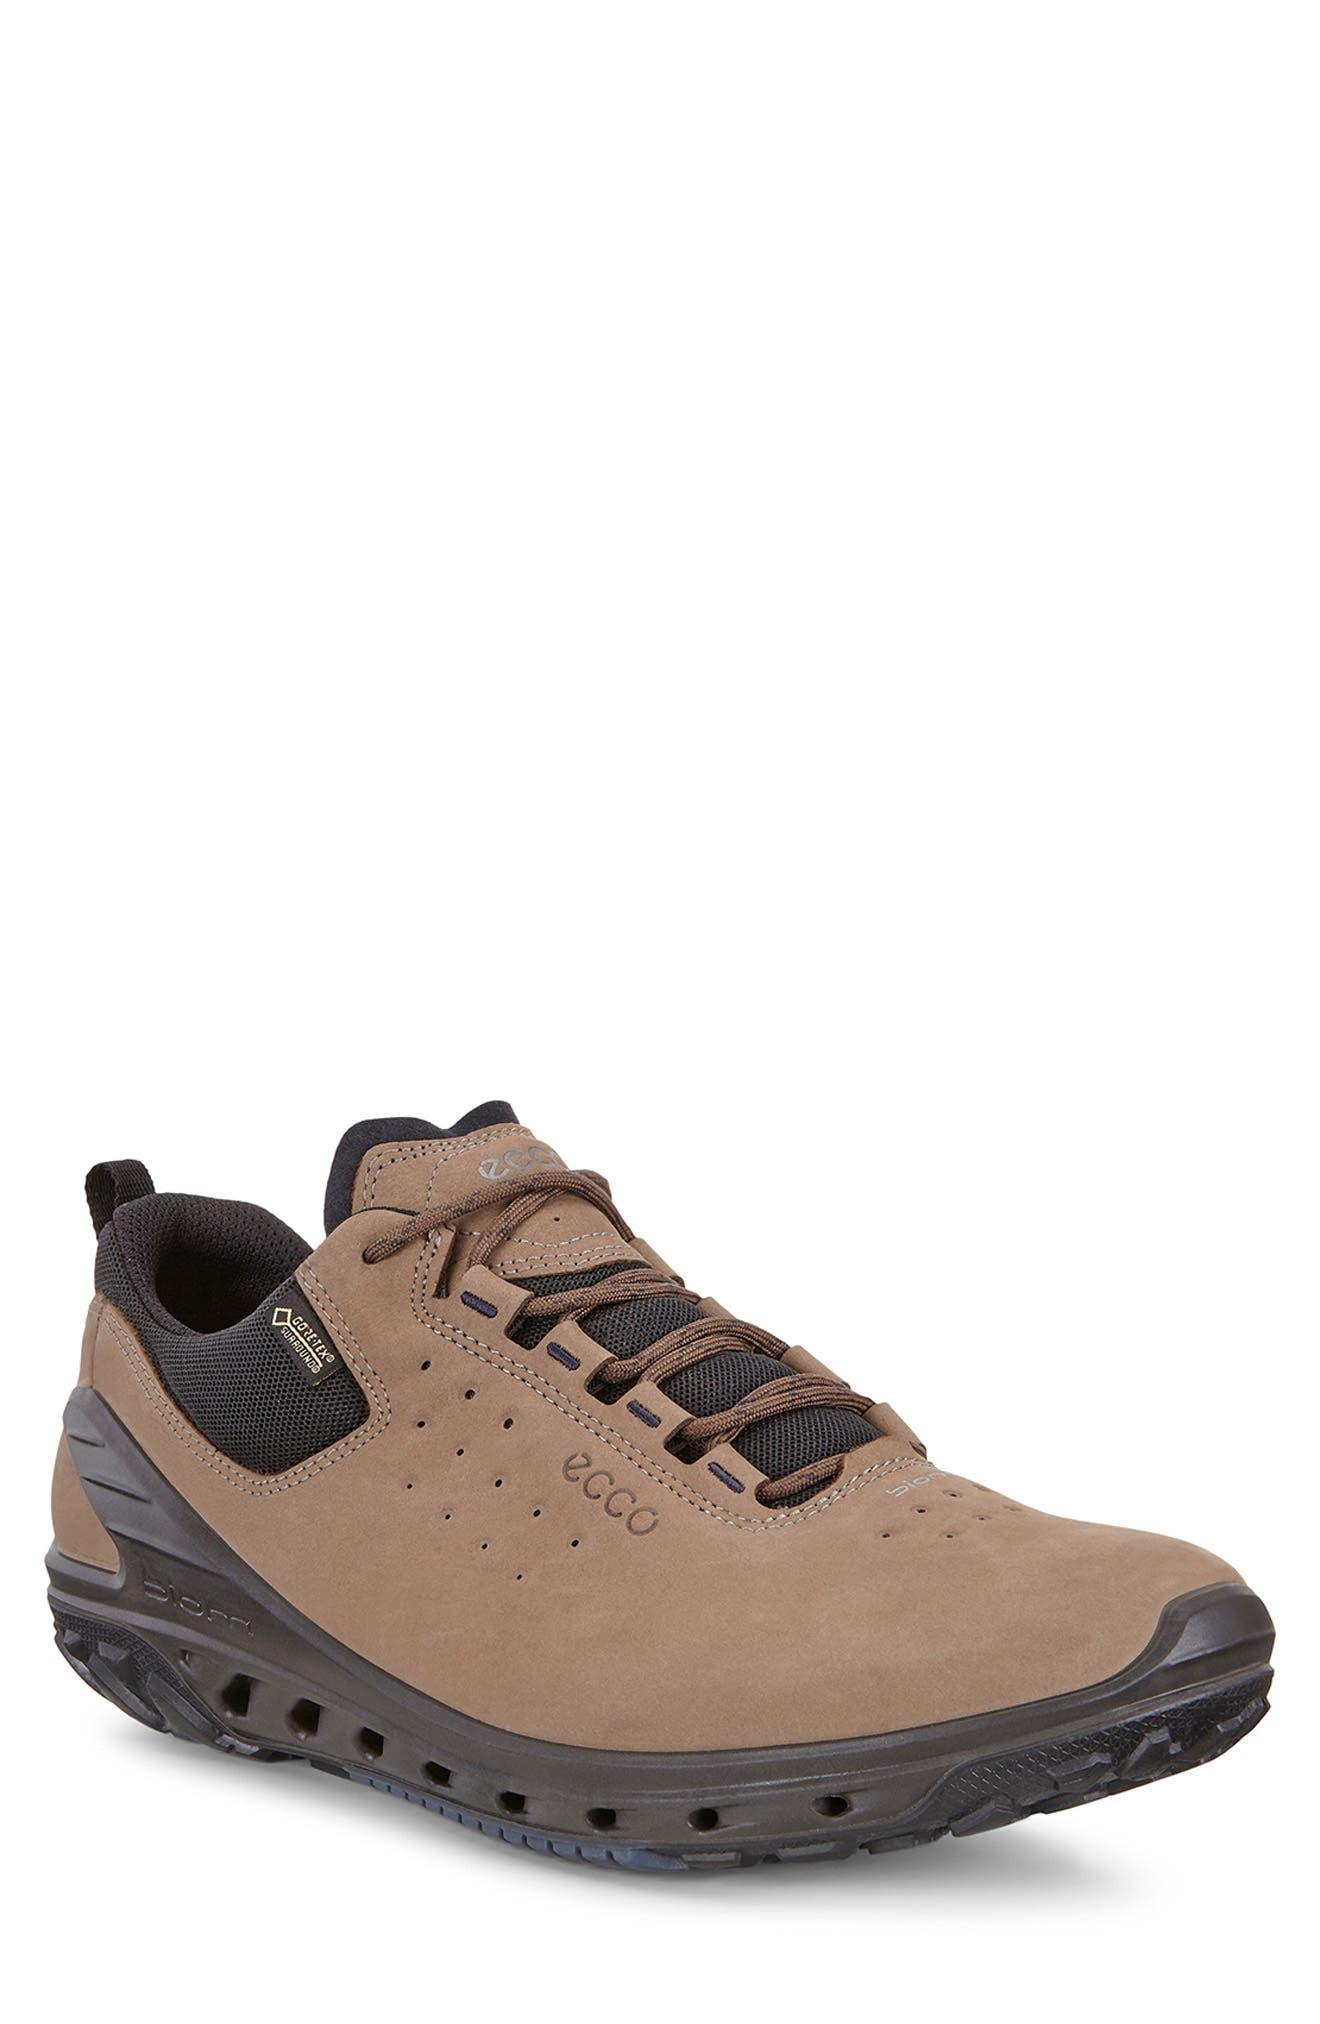 Biom Venture GTX Sneaker,                             Main thumbnail 1, color,                             BIRCH BROWN LEATHER